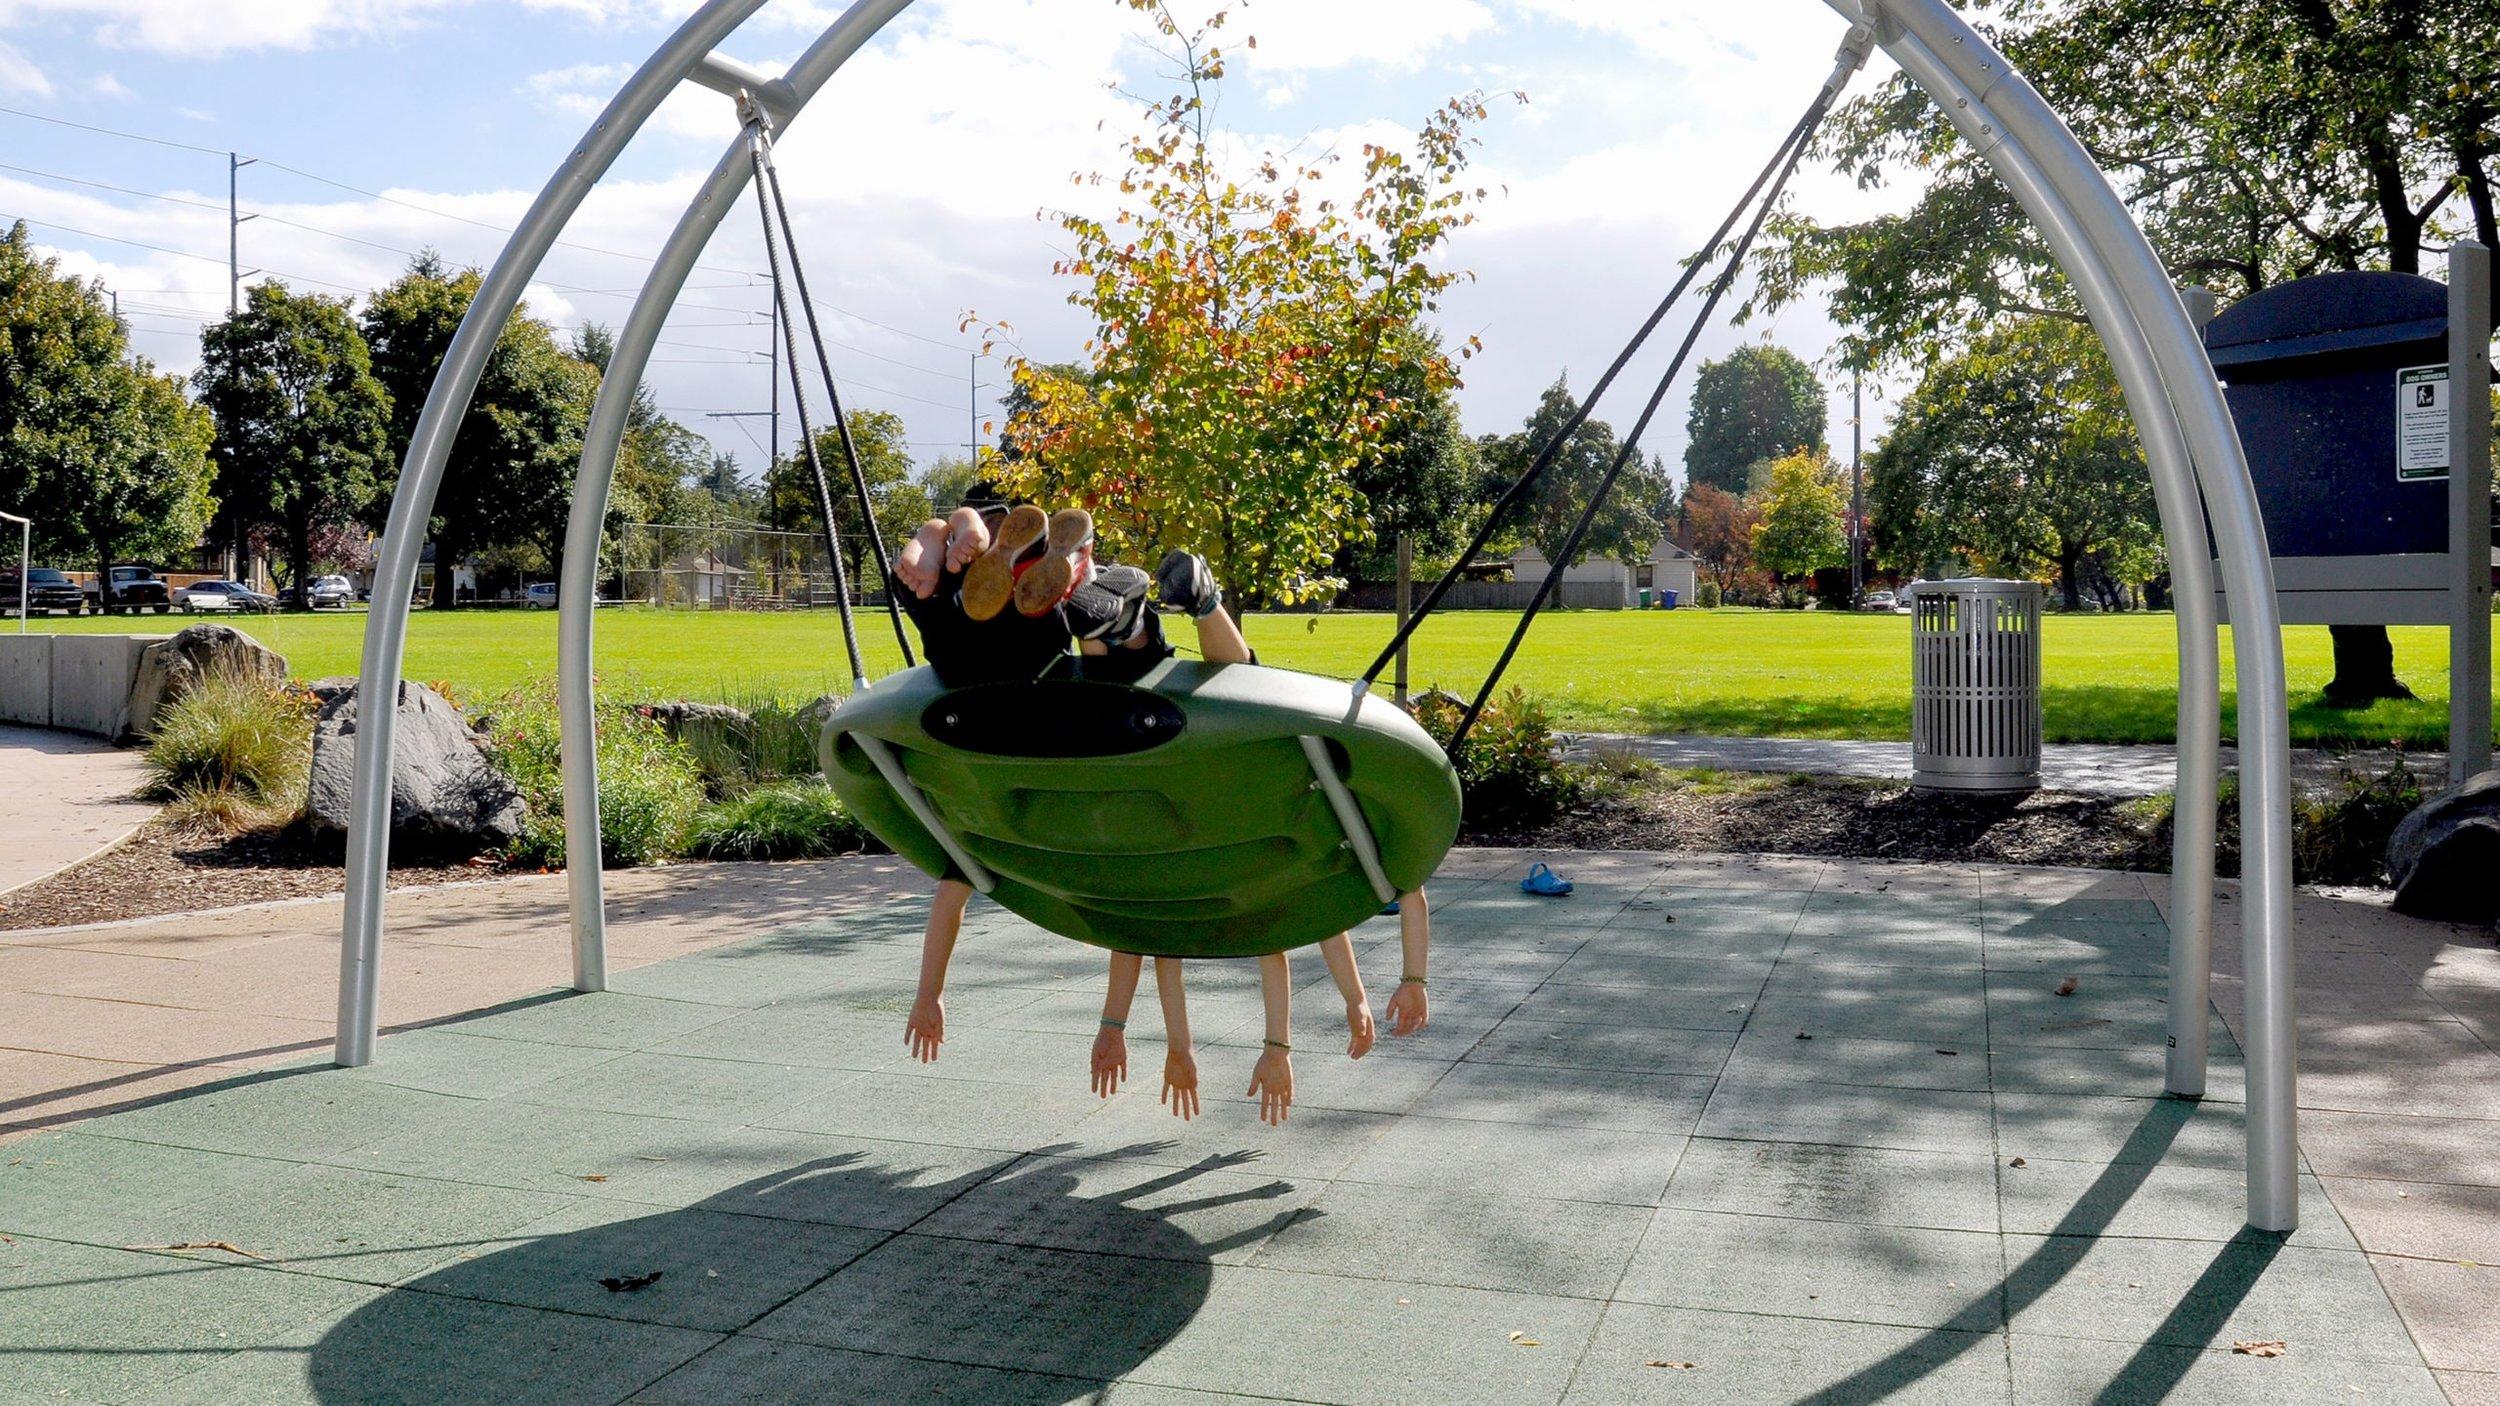 Harpers-playground-4-copy-2560x1440.jpg